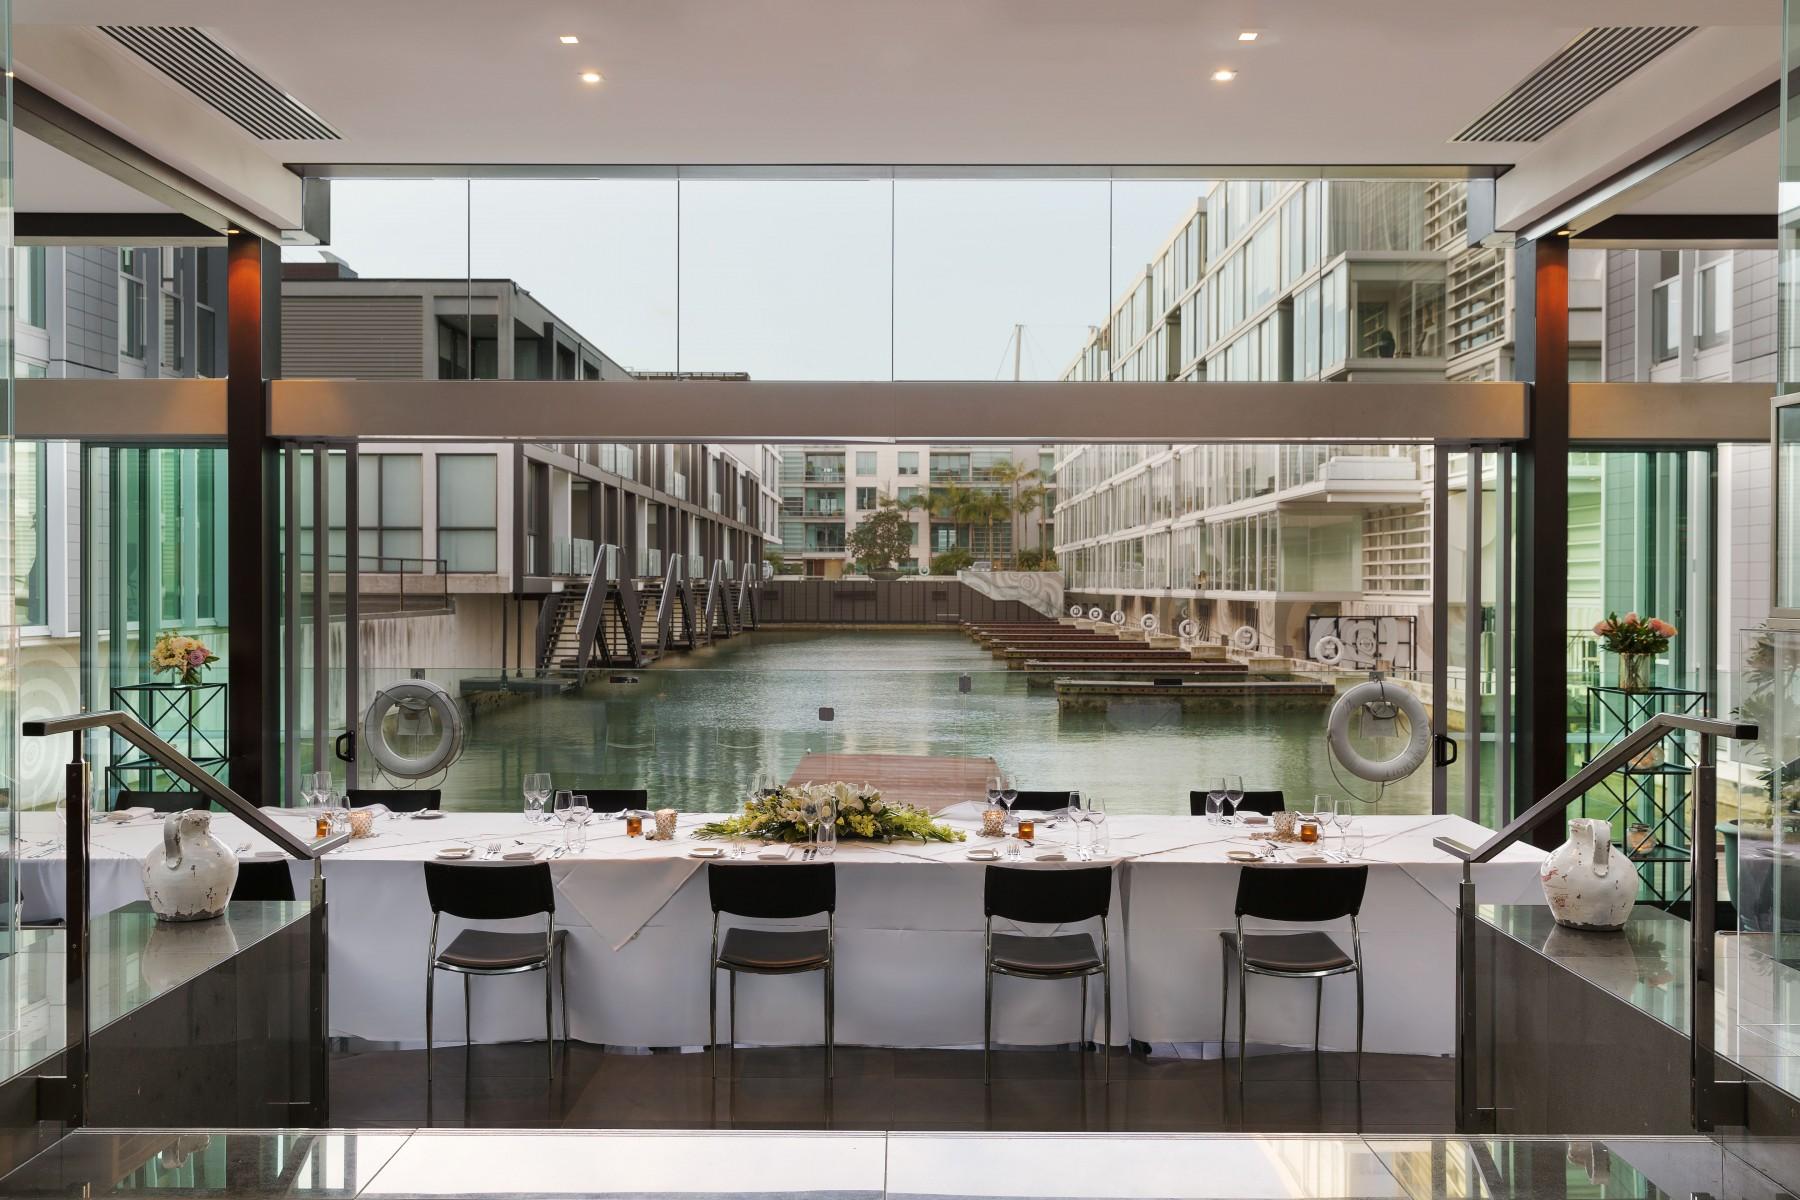 Marina-Terrace-Dinner-Set-up-2-2MB.jpg